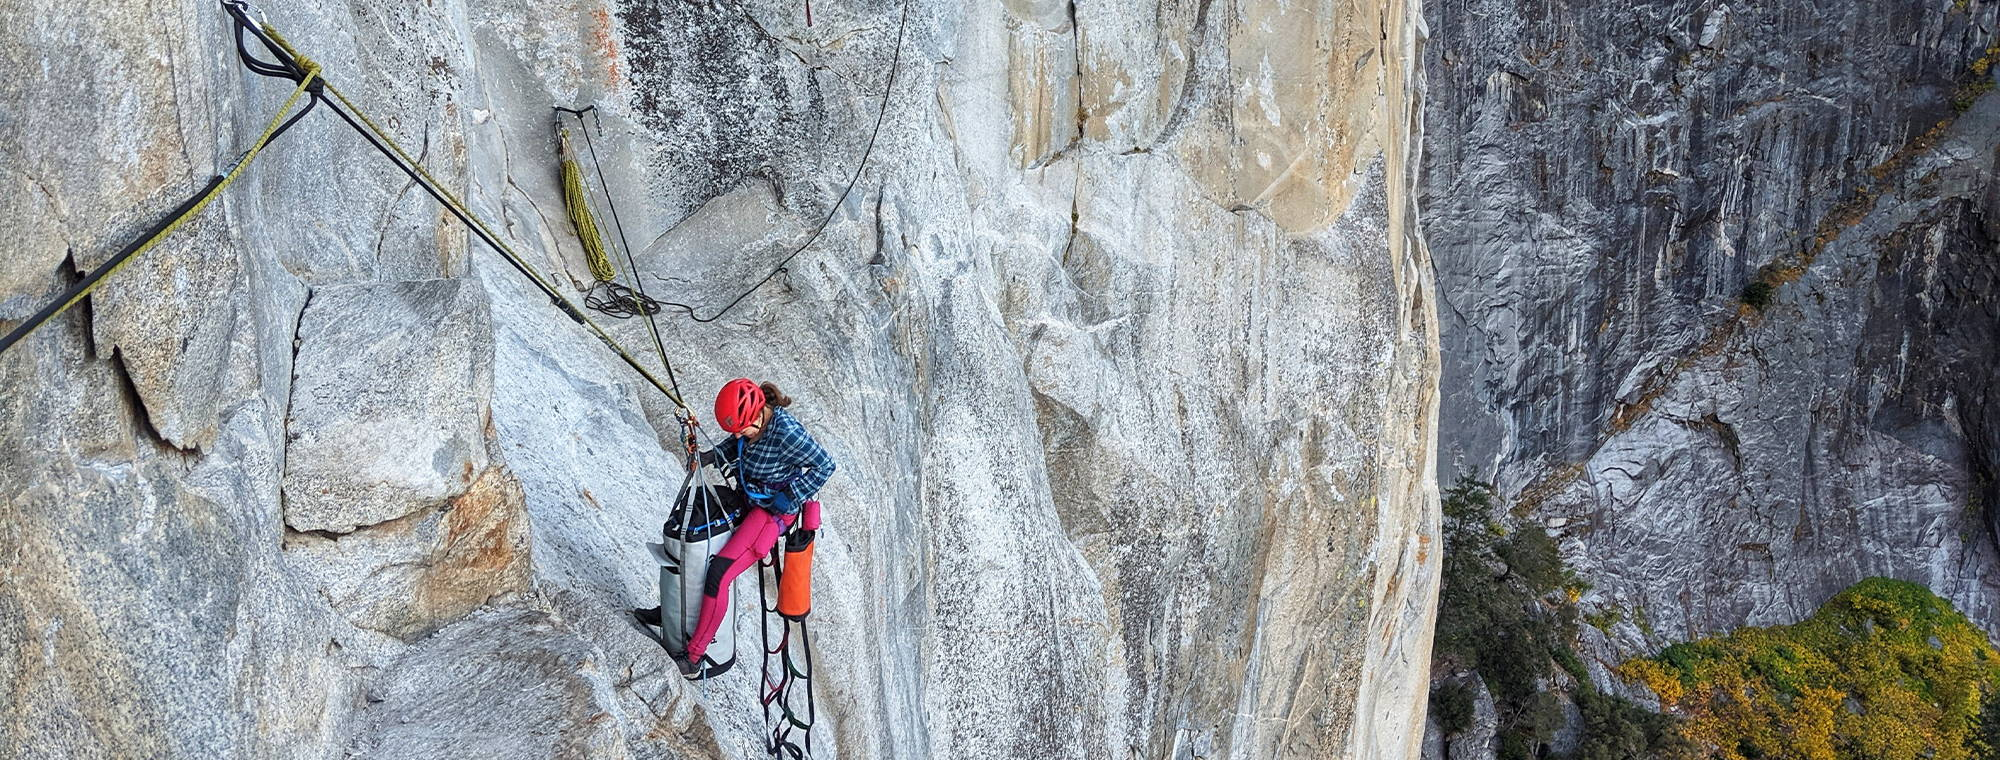 NW Alpine Ambassador Natalie Afonina Climbing in Yosemite